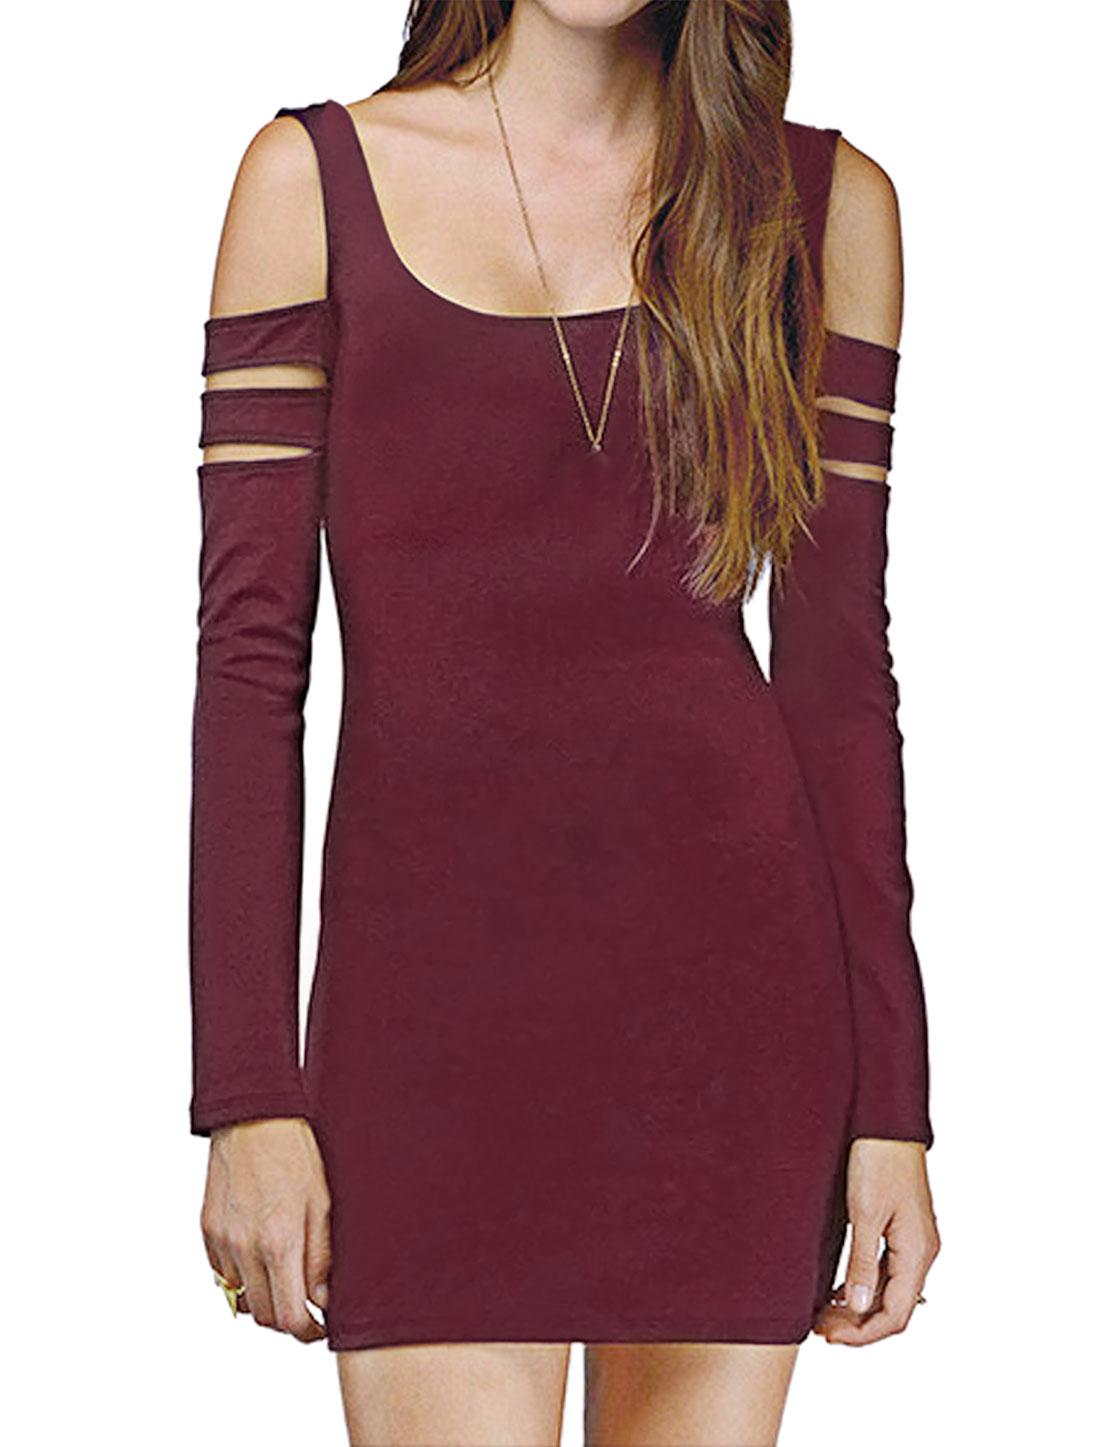 Ladies Scoop Neck Long-sleeved Cut Out Shoulder Short Dress Purple M